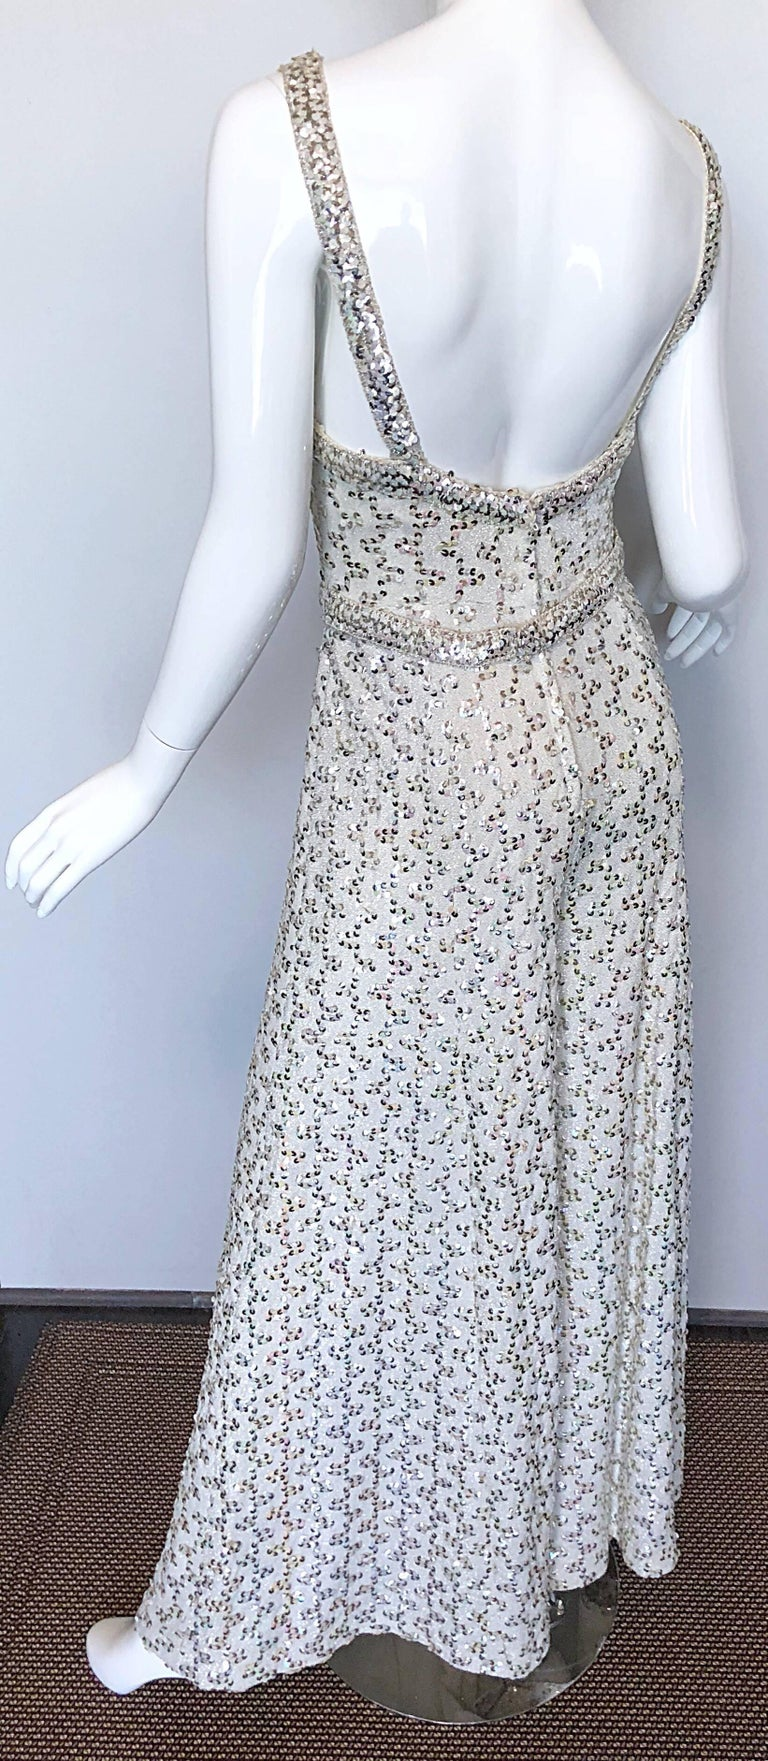 Vintage Lilli Diamond 1970s Silver Sequined 70s Amazing Lurex Wide Leg Jumpsuit For Sale 3